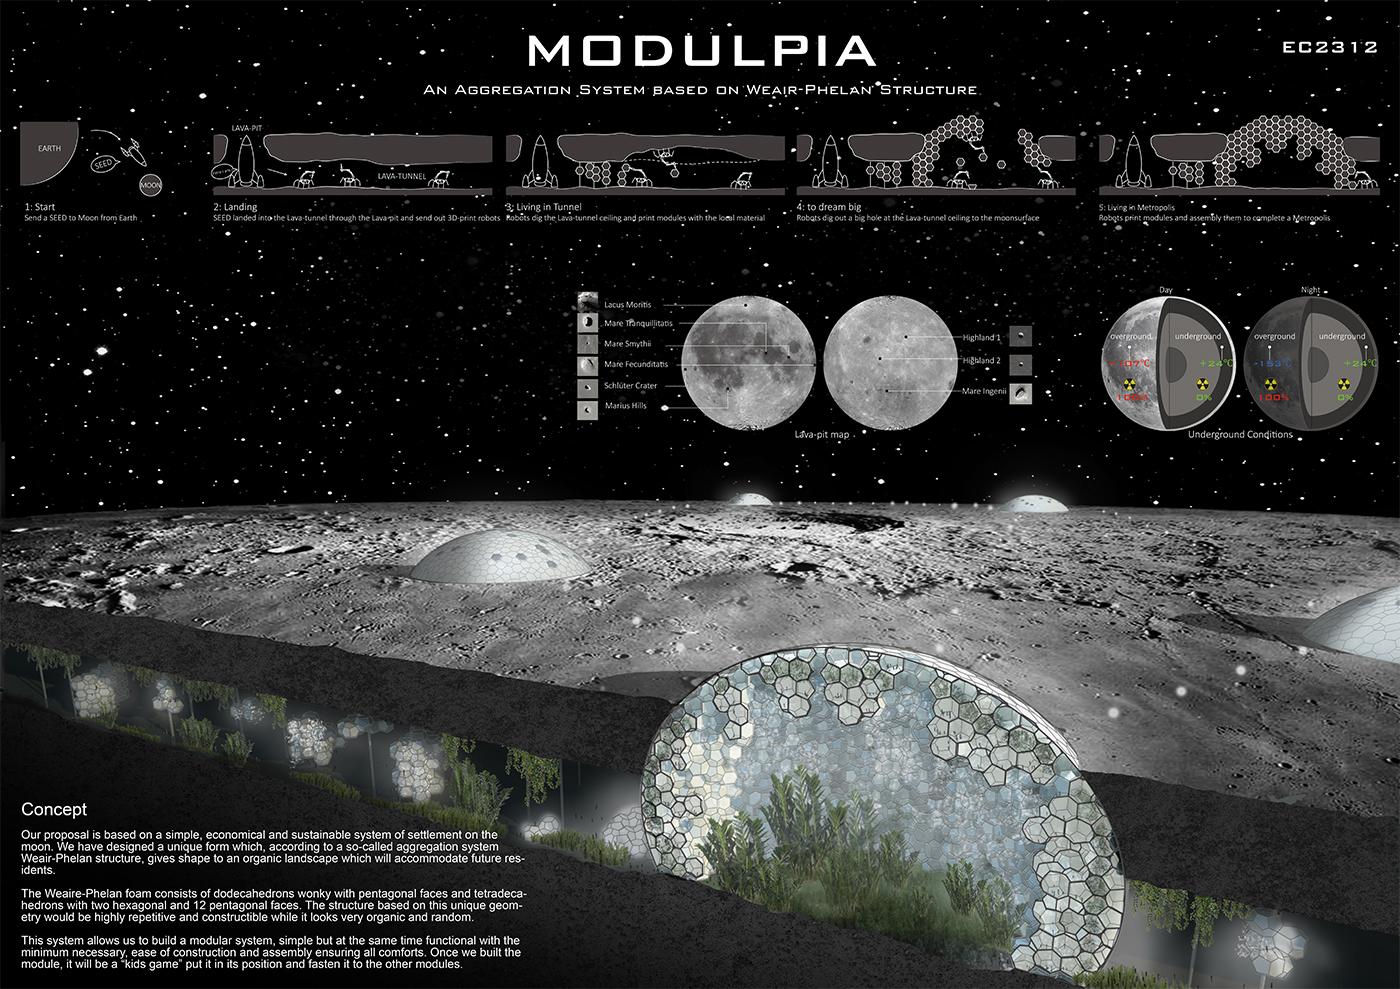 Gallery of 9 Visions for Lunar Colonies Selected as Winners